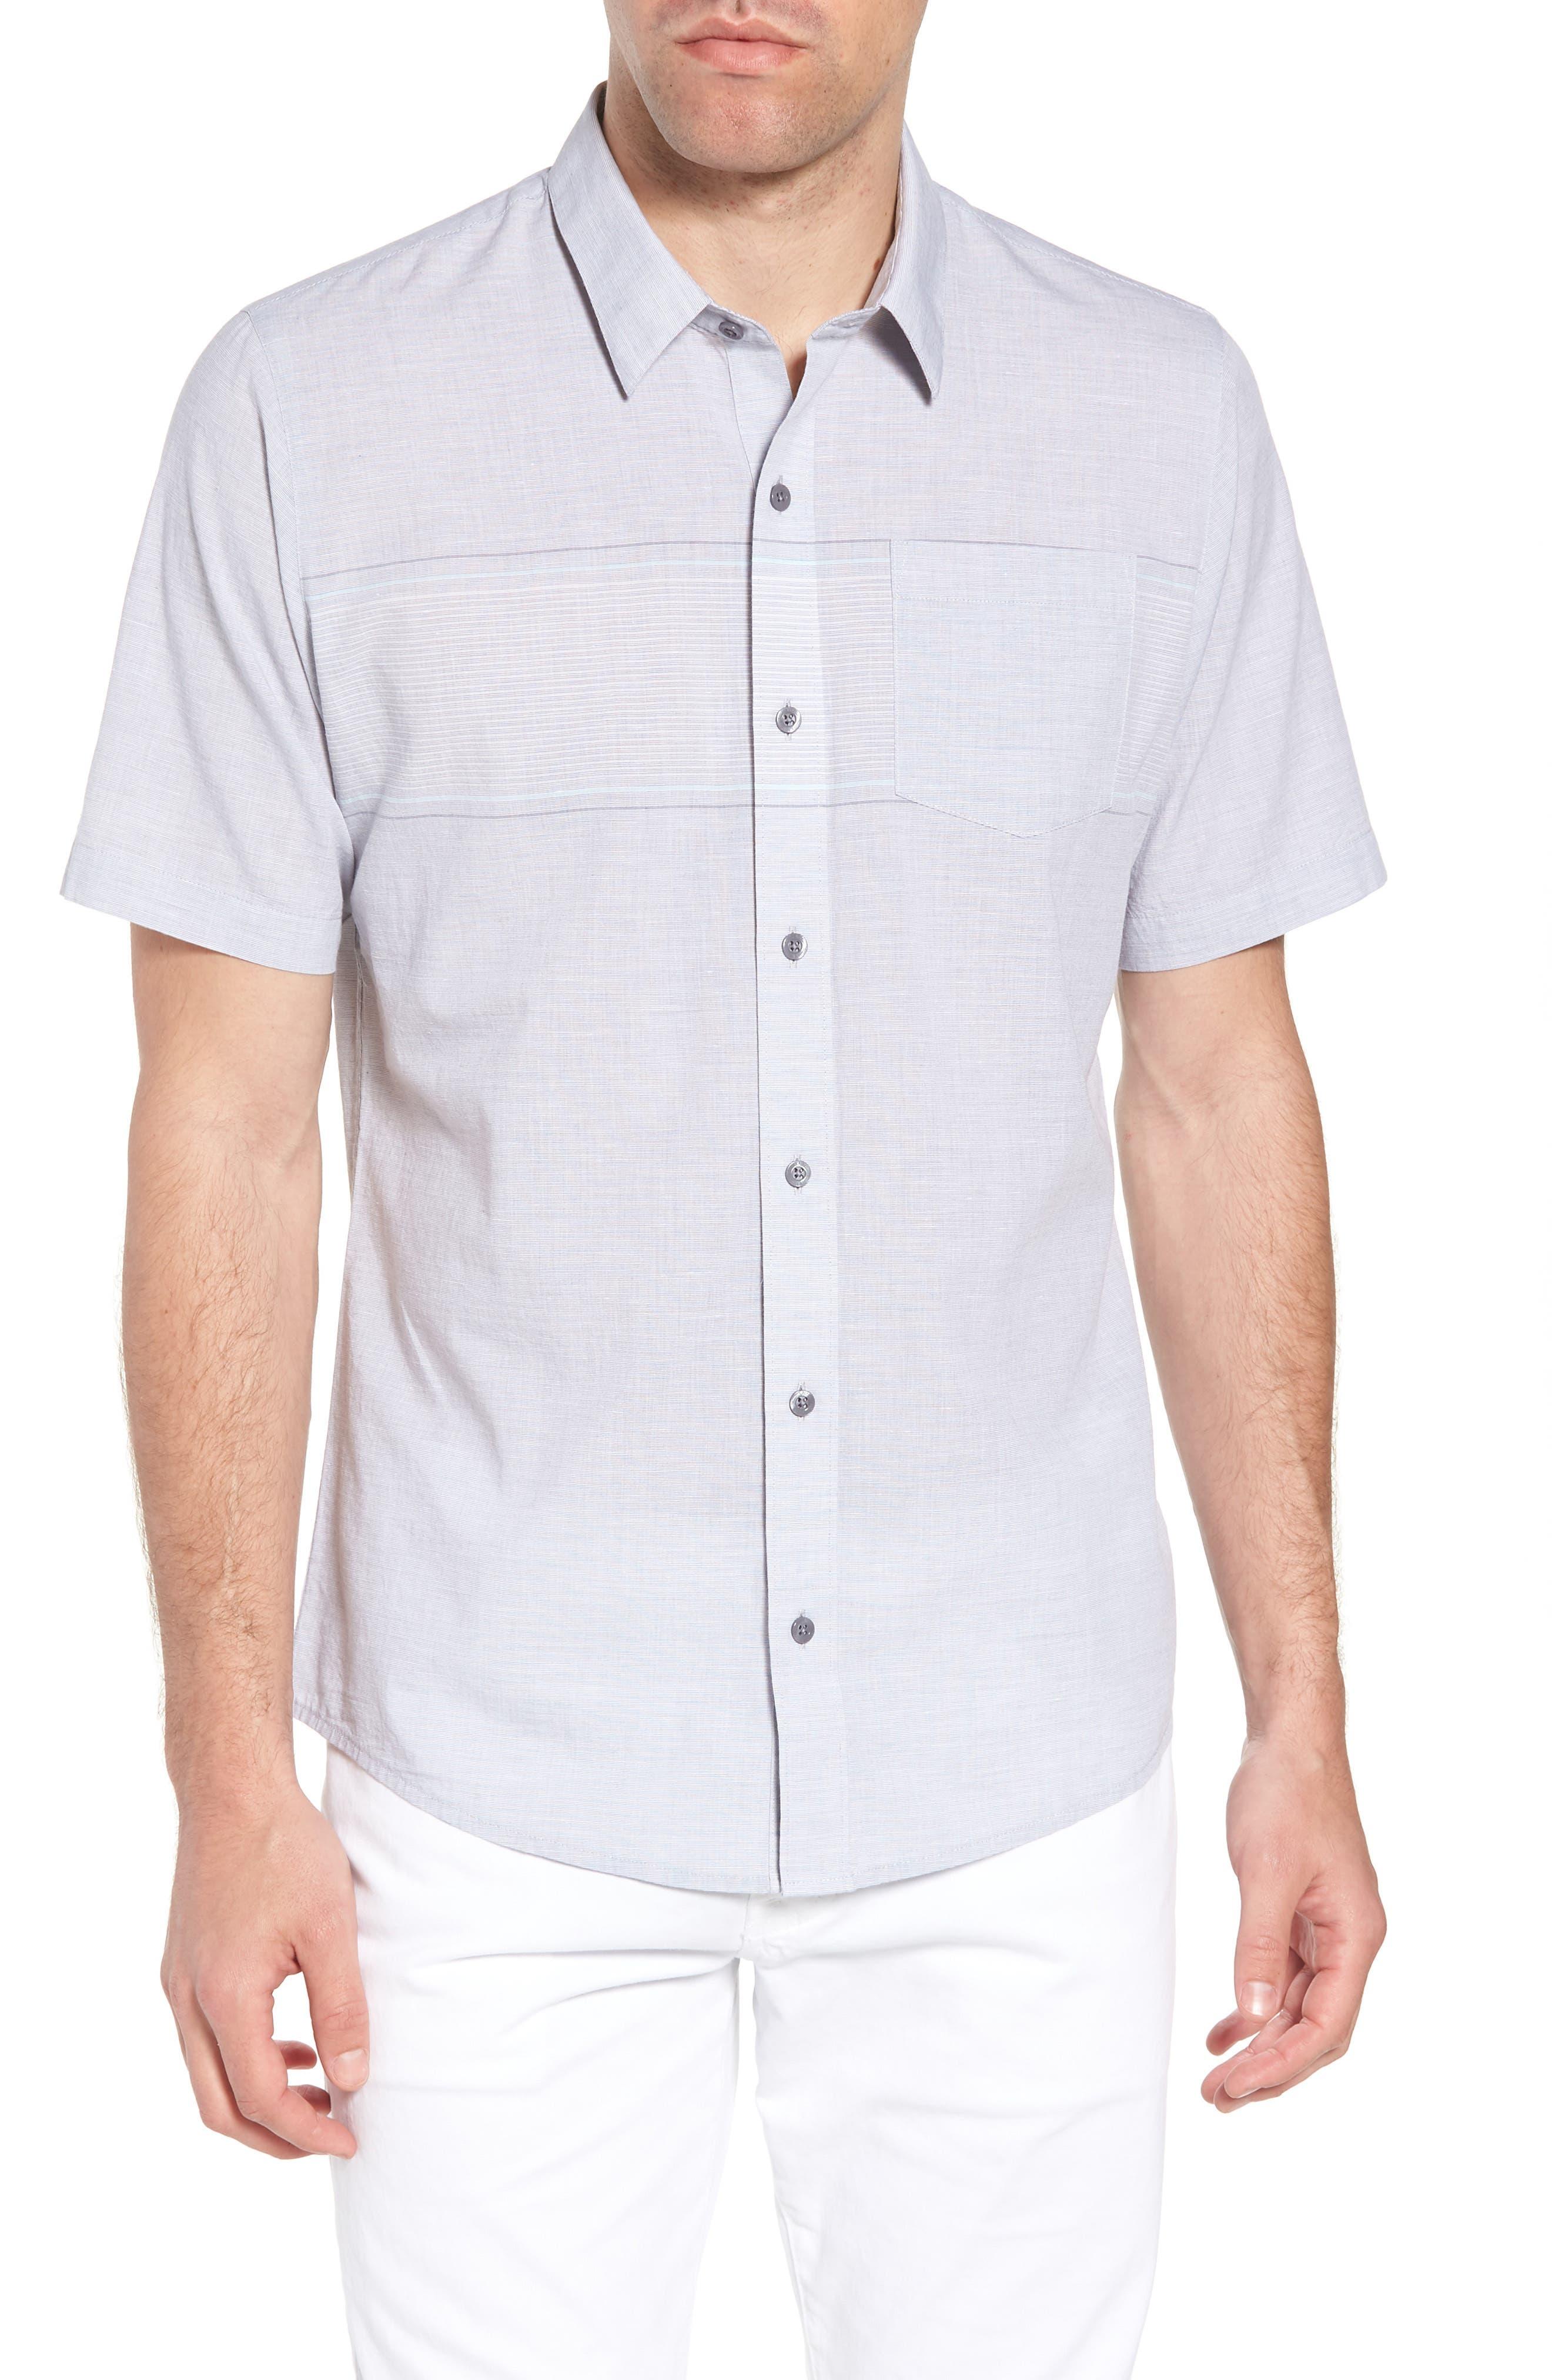 Oscar Regular Fit Sport Shirt,                         Main,                         color, HEATHER GRASILLE